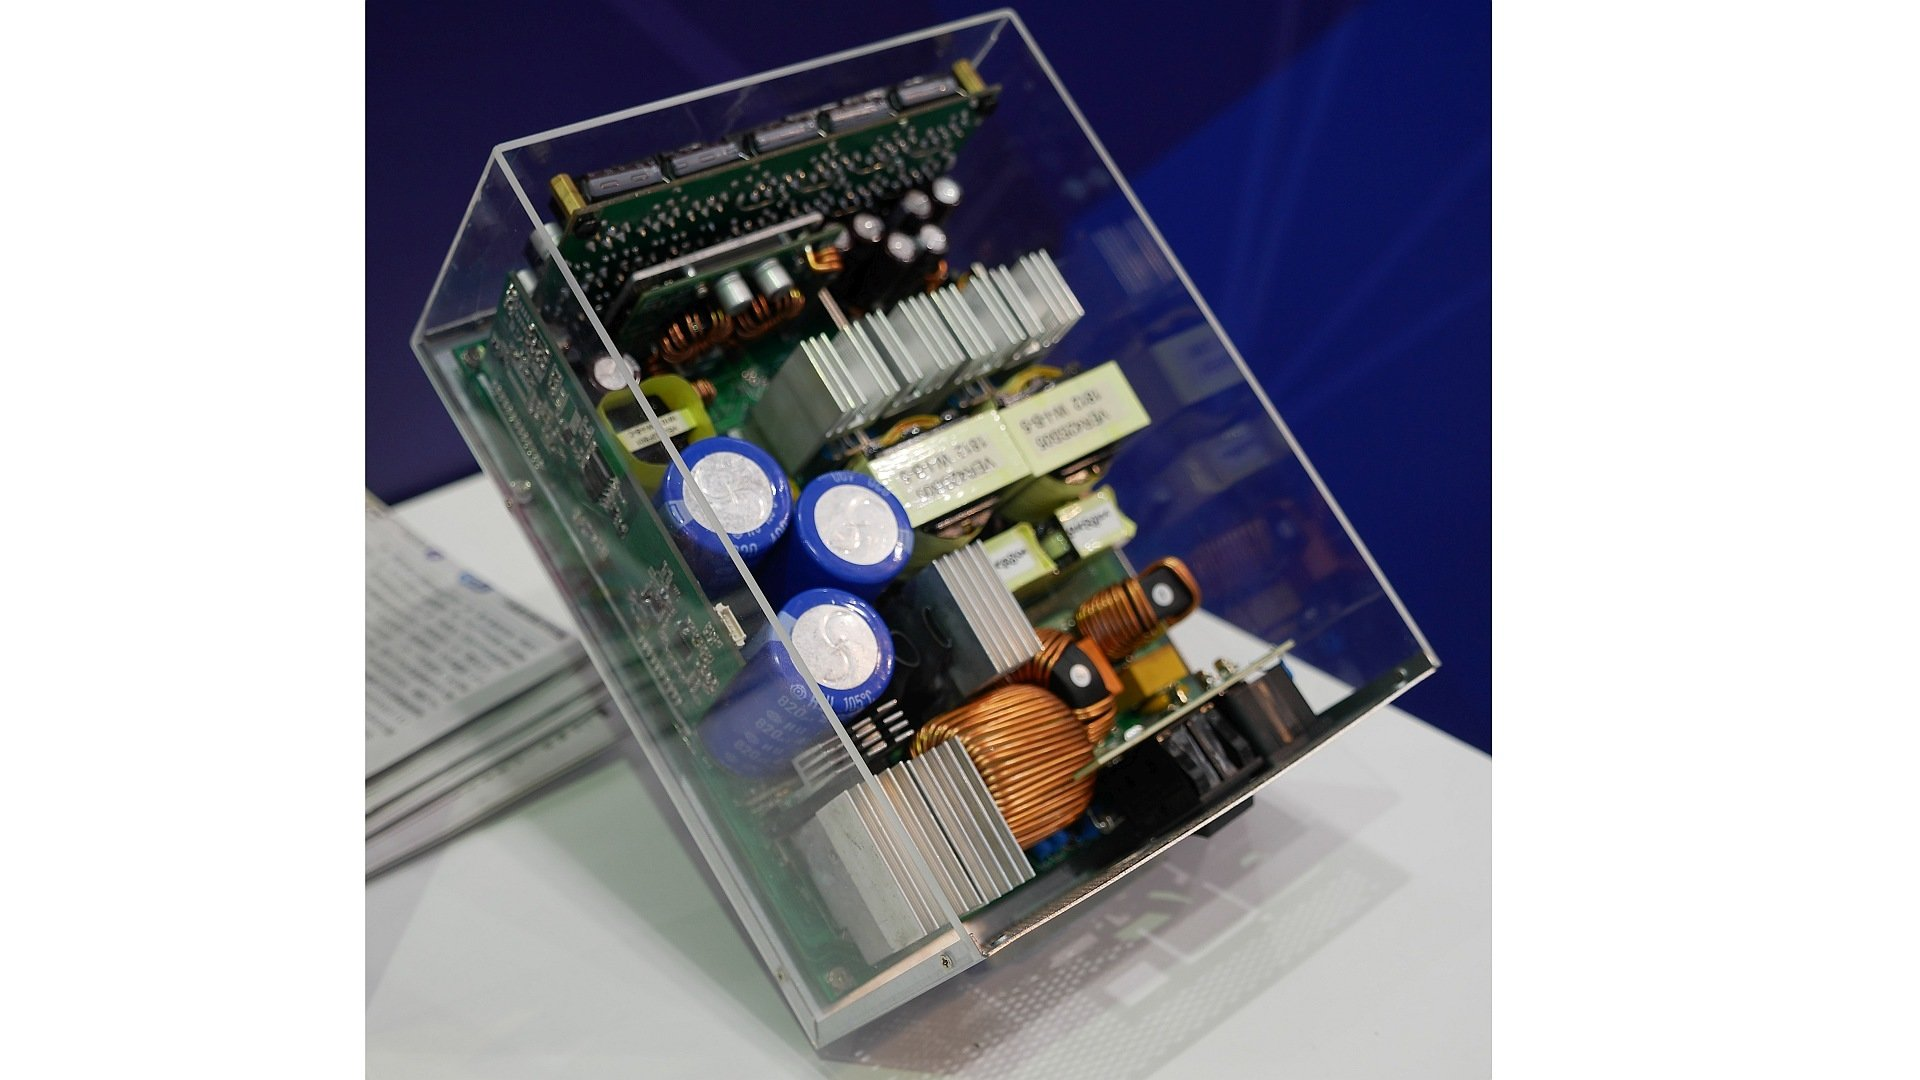 Sea Sonic Netzteil-Prototyp mit 1,6 kW PFC